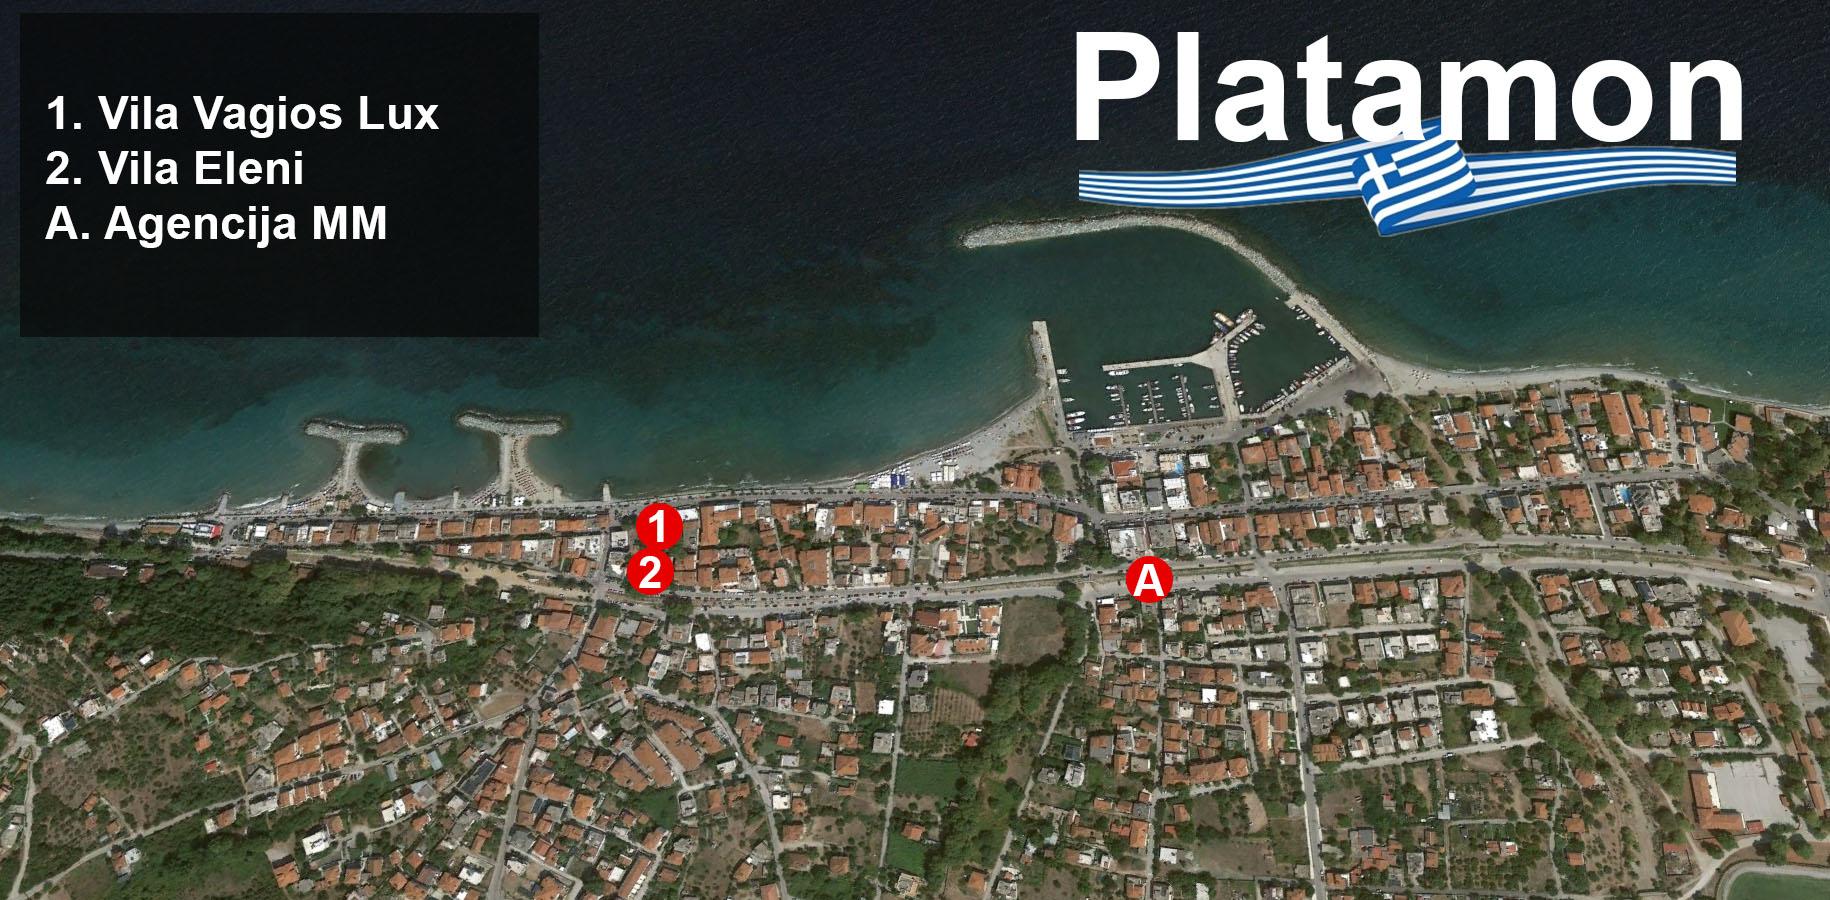 Mapa Platamona 2019 Holiday Turisticka Agencija